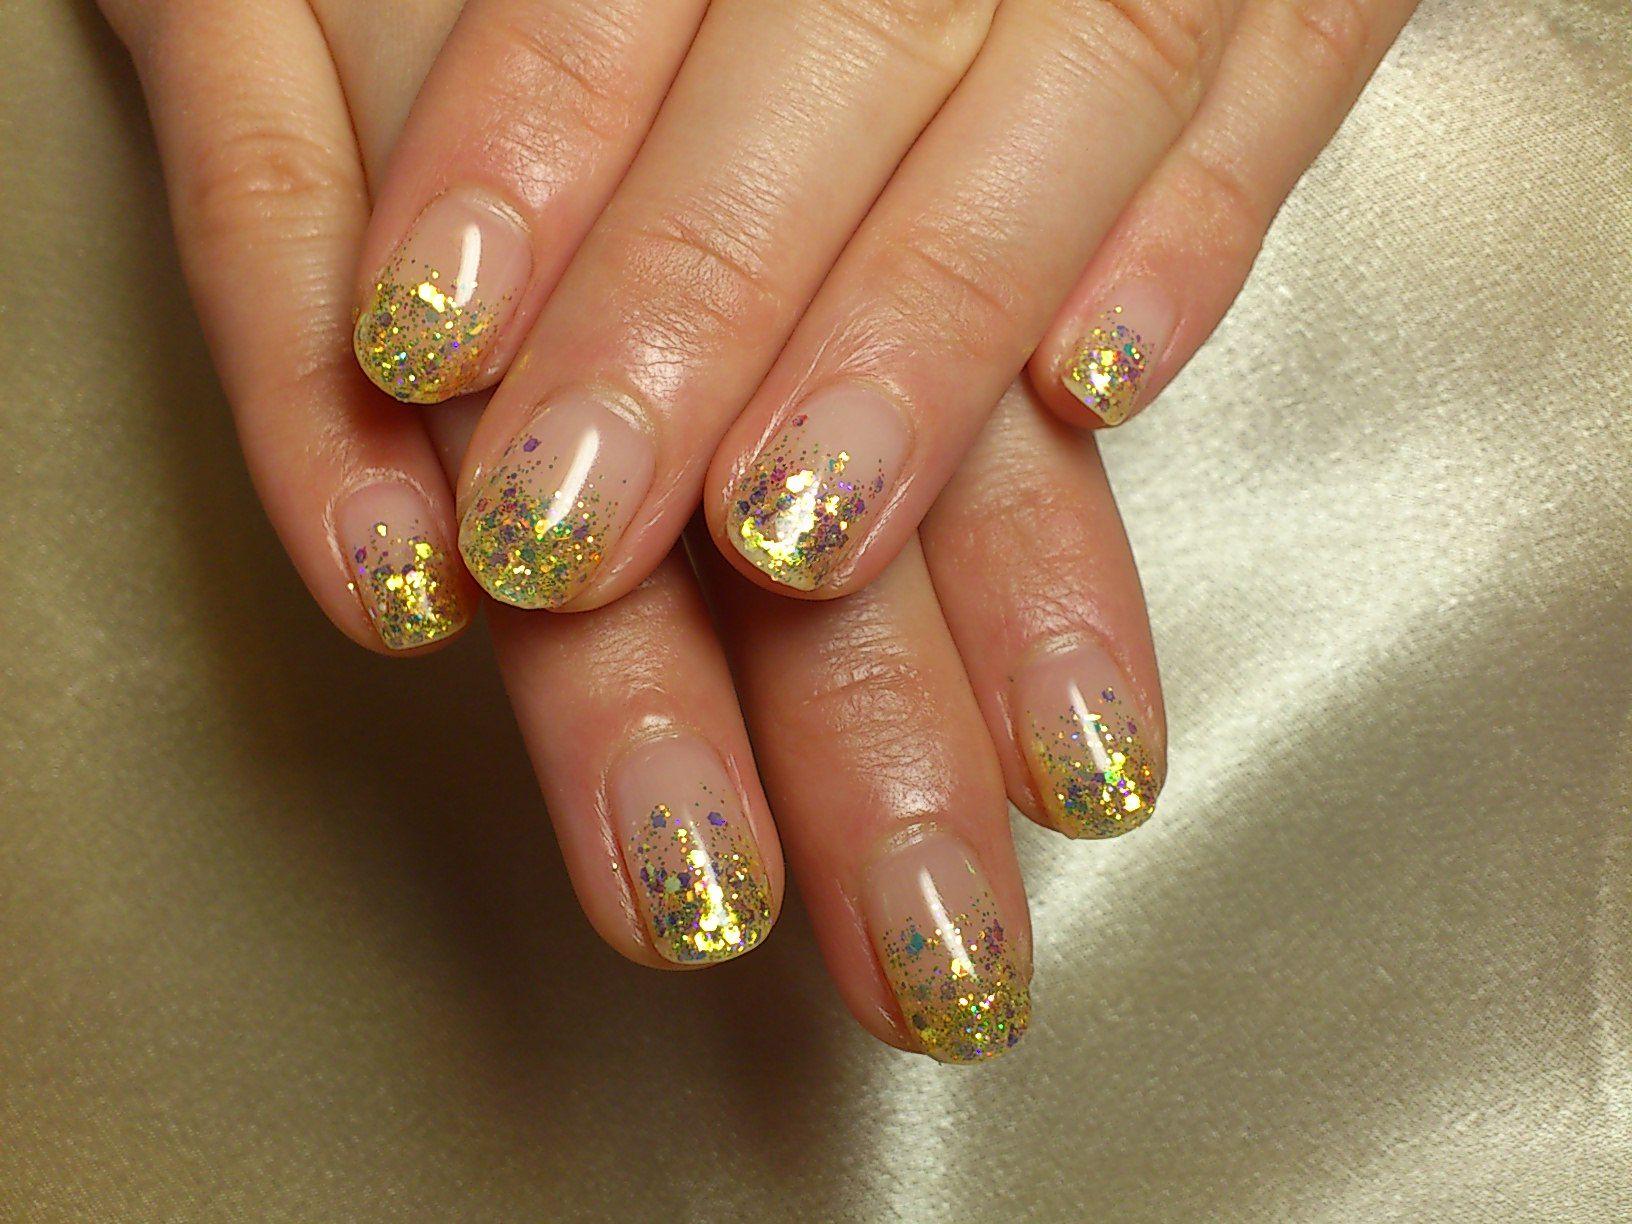 Shiny nails | Shiny nails, Nails, Shiny